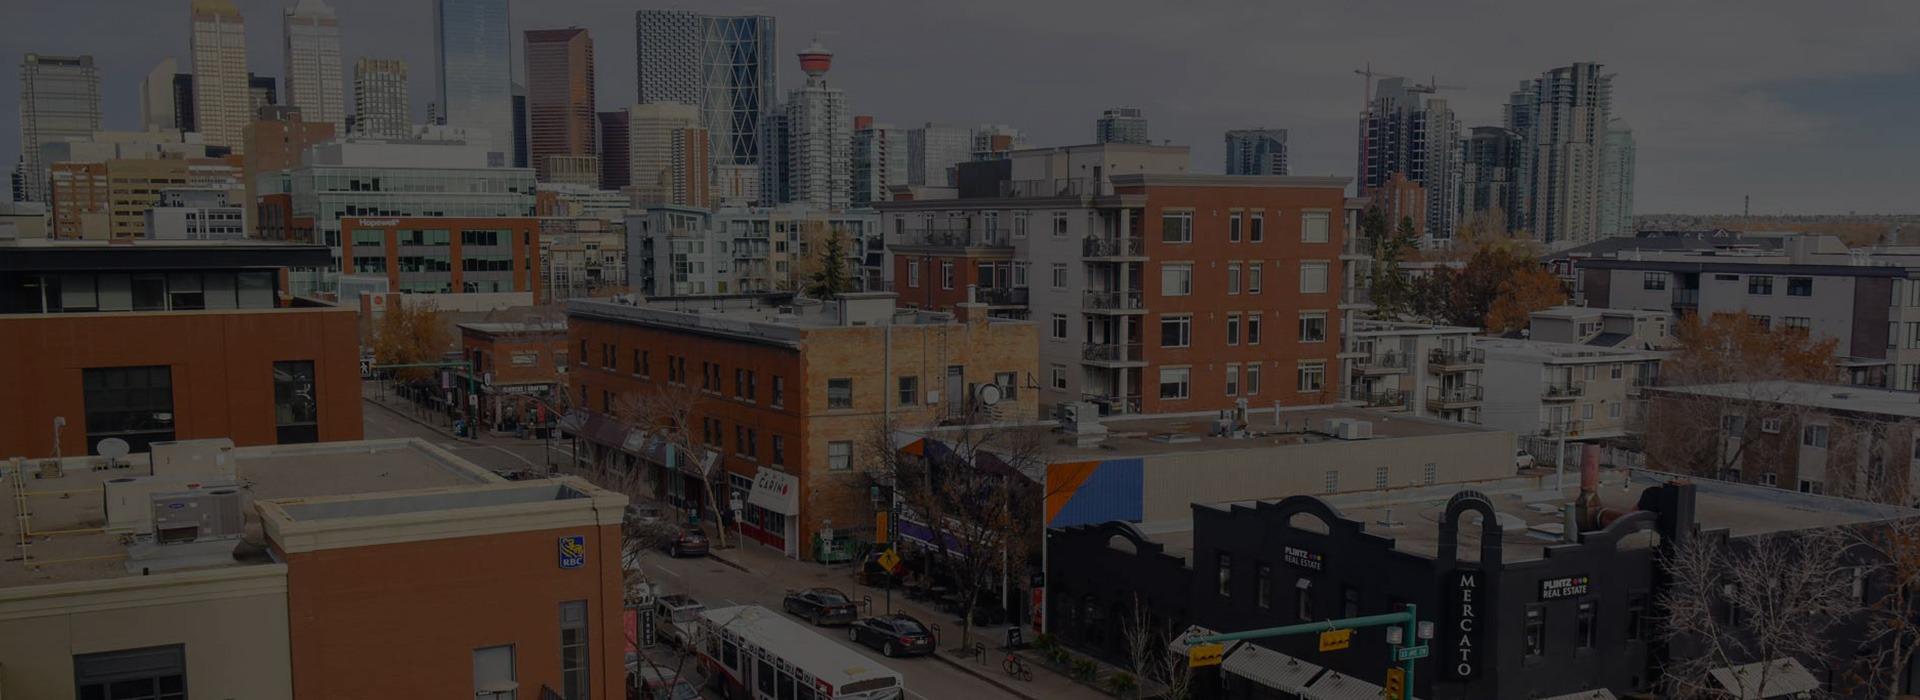 Office View | Key Prosthodontics | Calgary and Surrounding Area | Prosthodontic Specialist